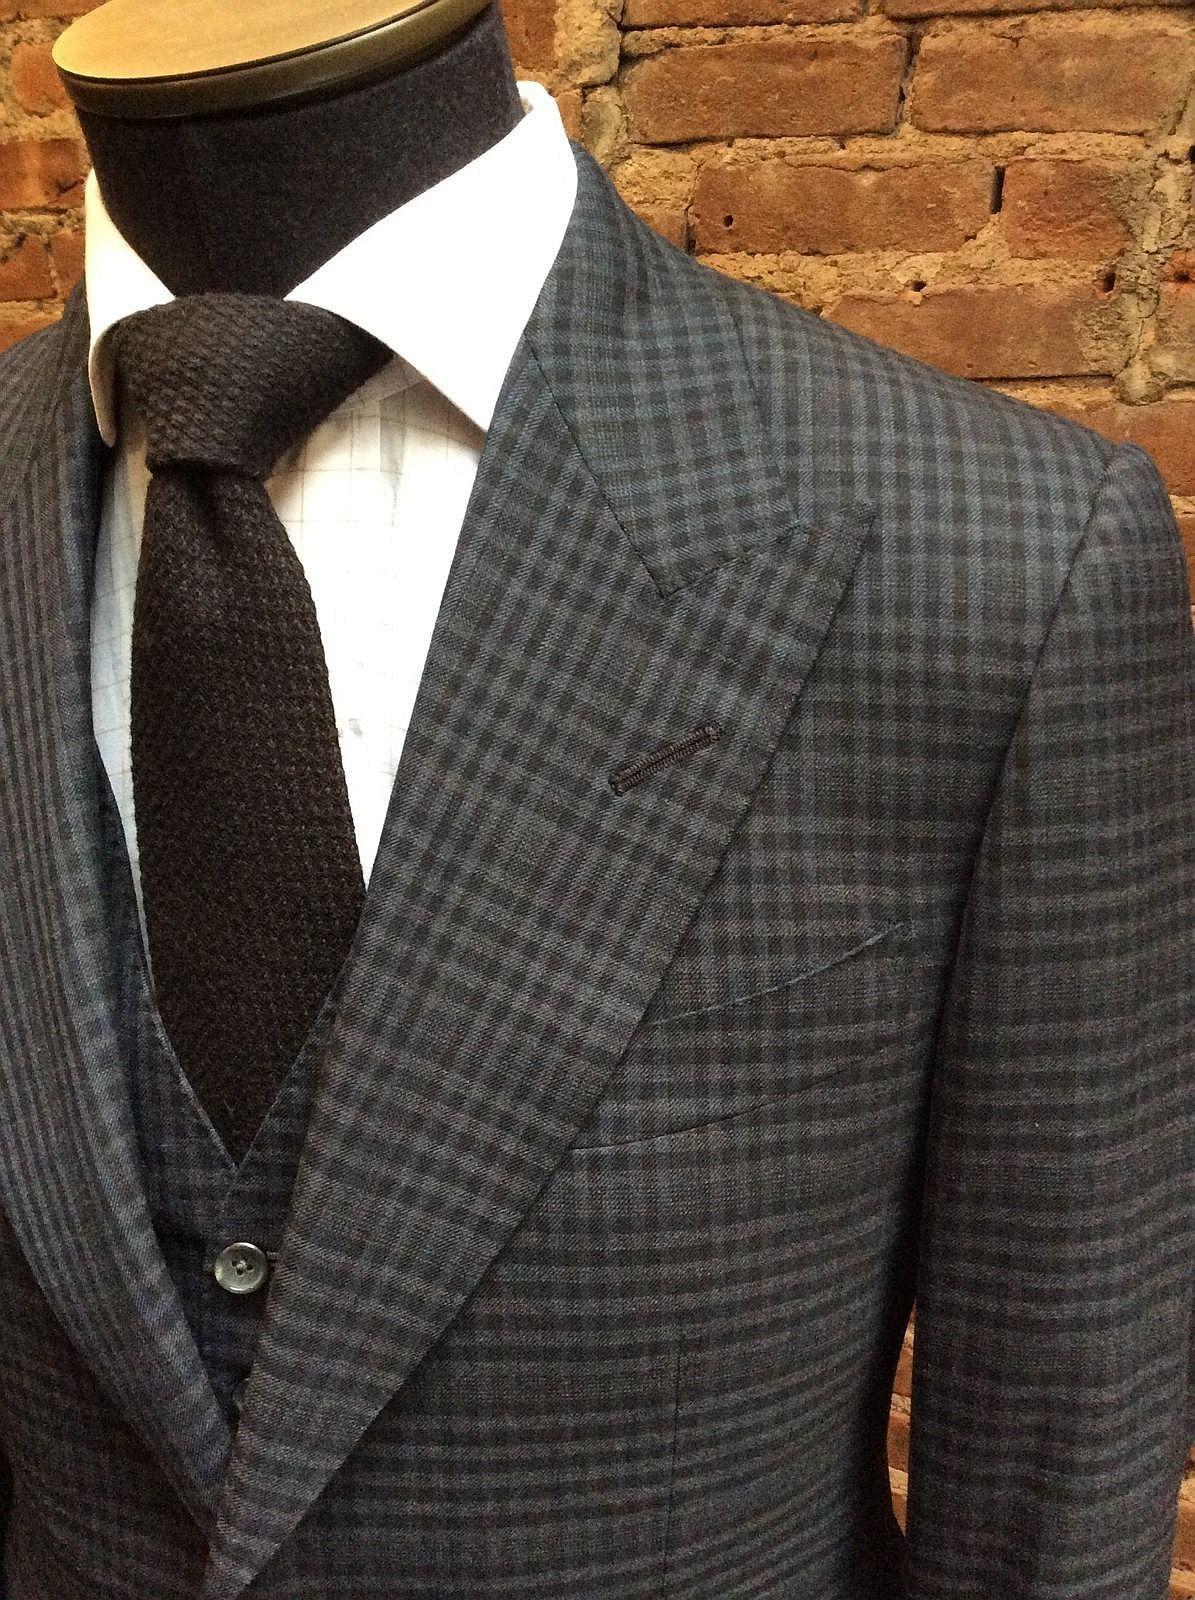 Tom Ford Suit Men' Pre-owned Custom 3 Piece Plaics & Checks Two Button Designer